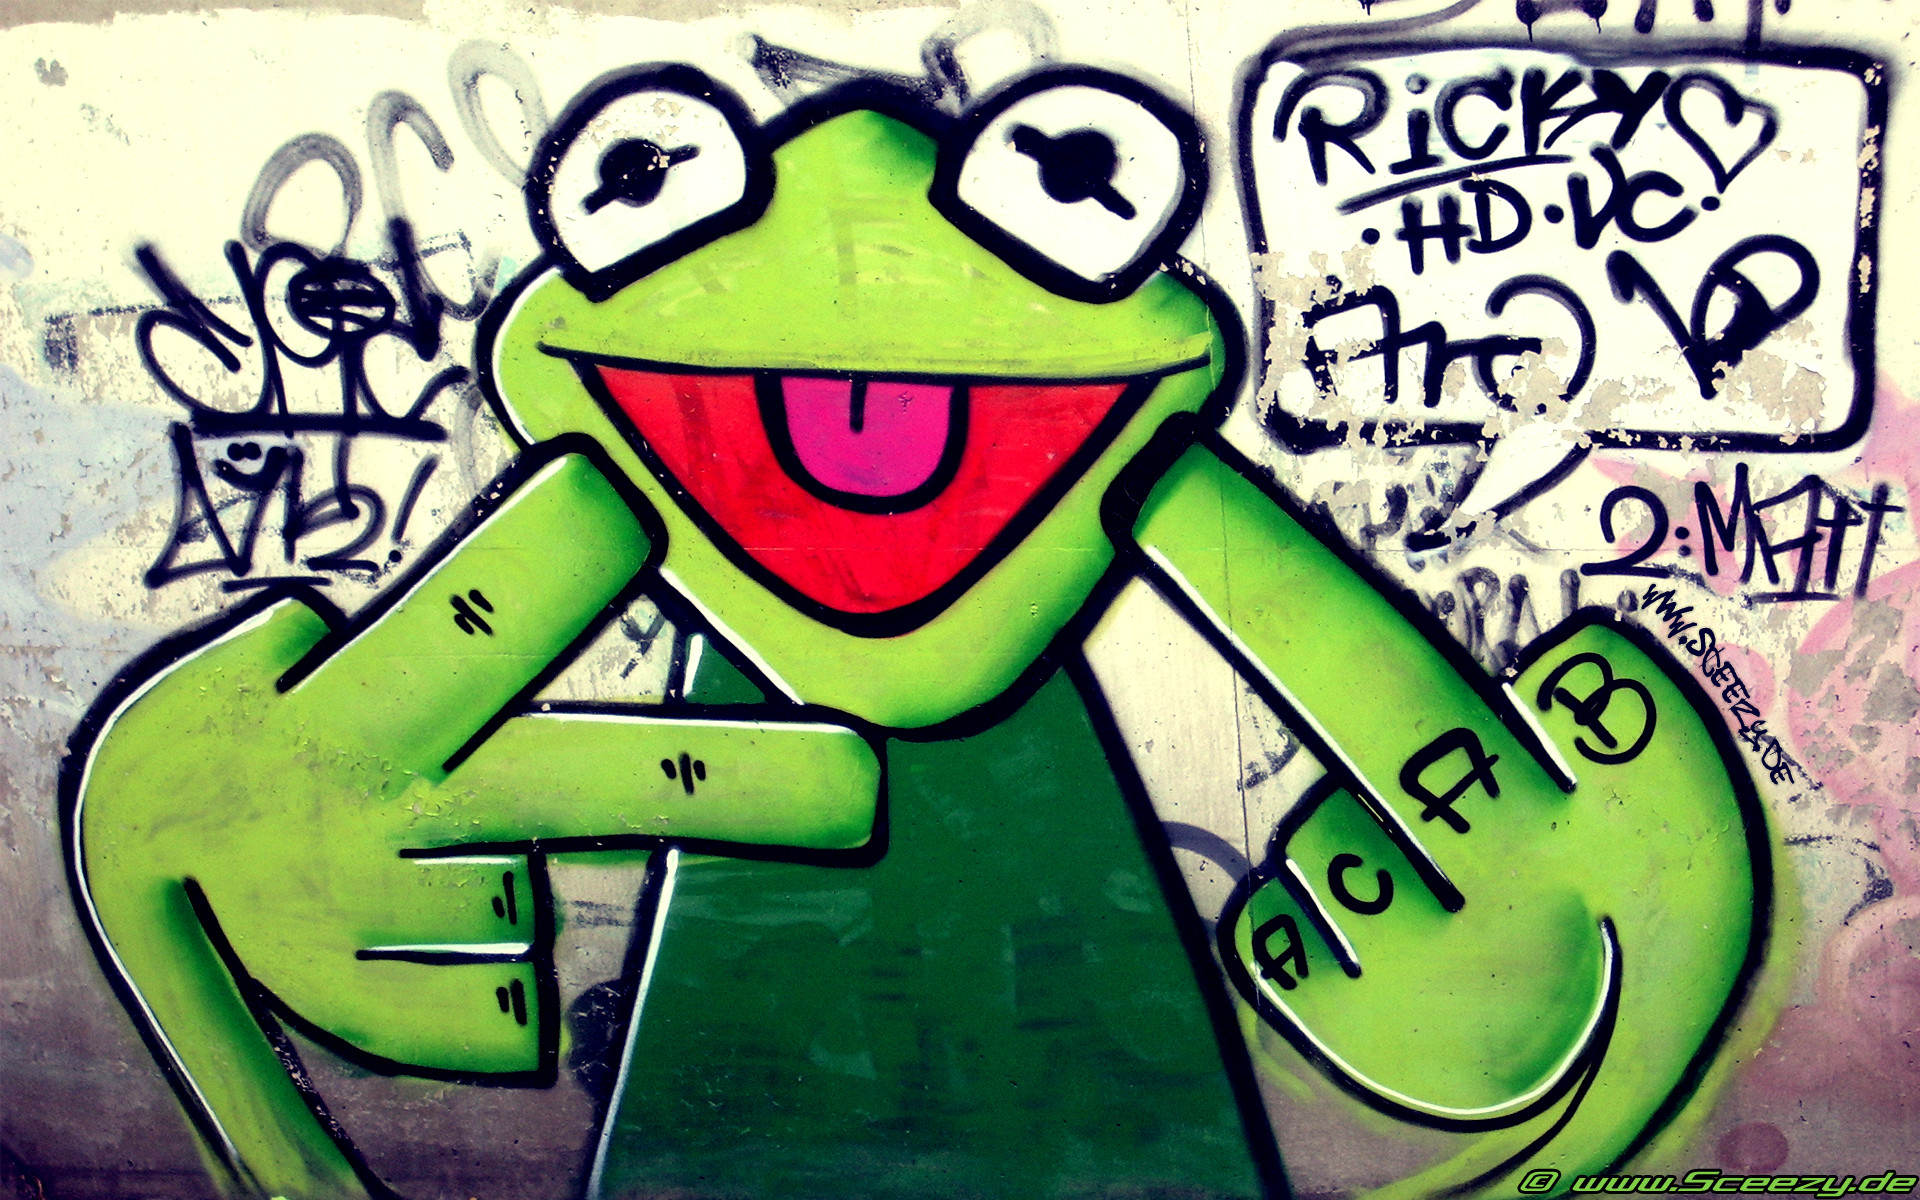 Graffiti urban kermit fuck gesture wallpaper | | 29416 |  WallpaperUP